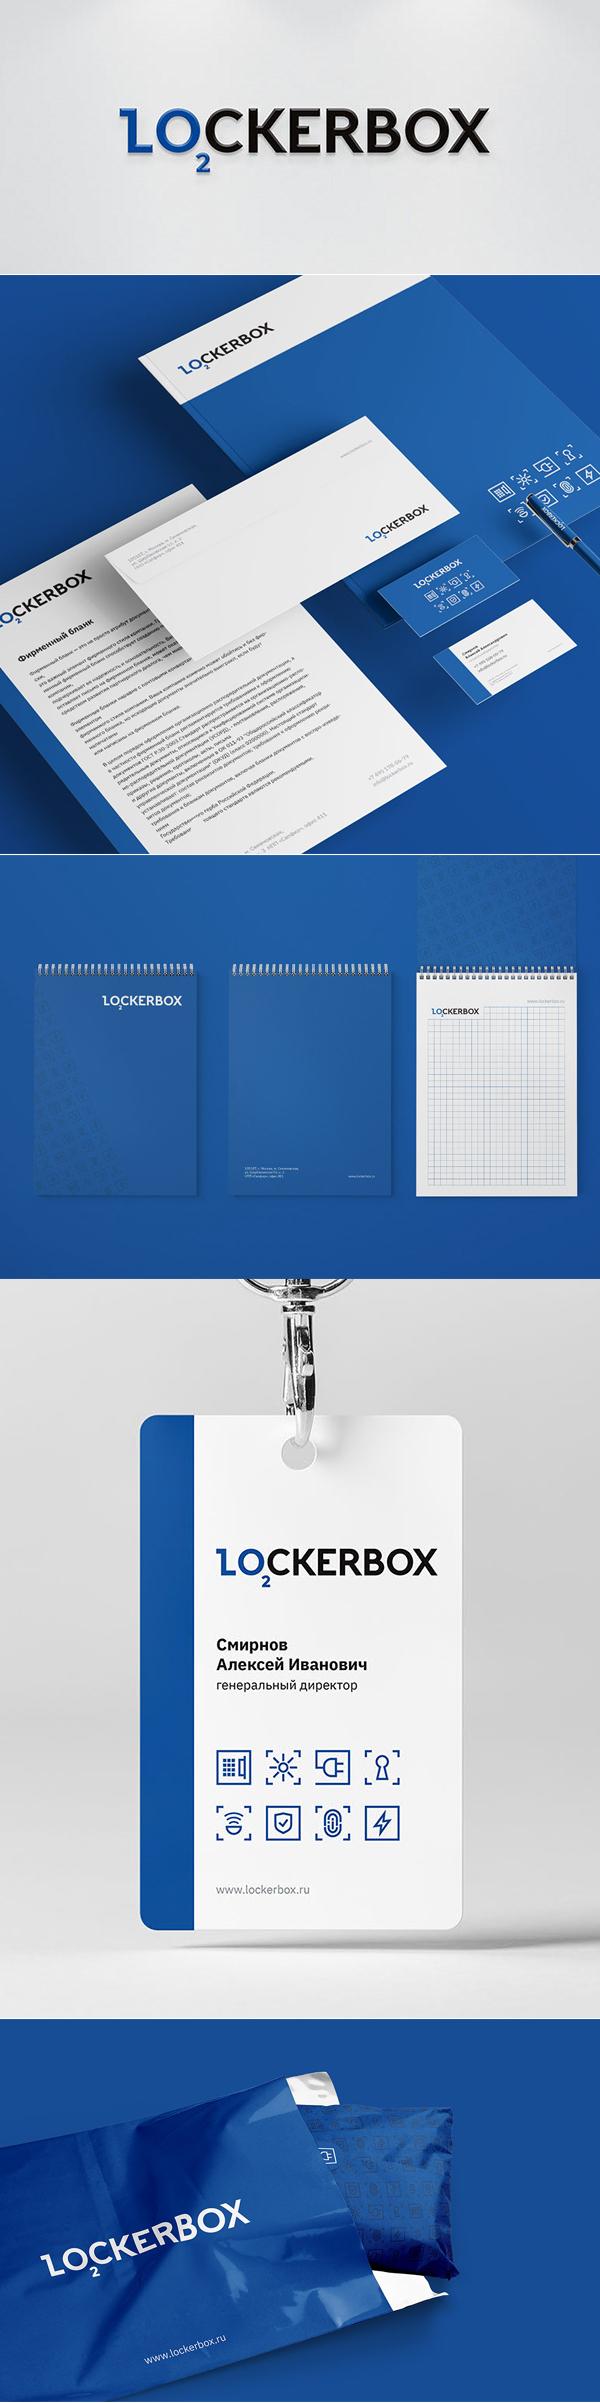 Branding: Lockerbox Logo and Branding by Ashot Tatyan